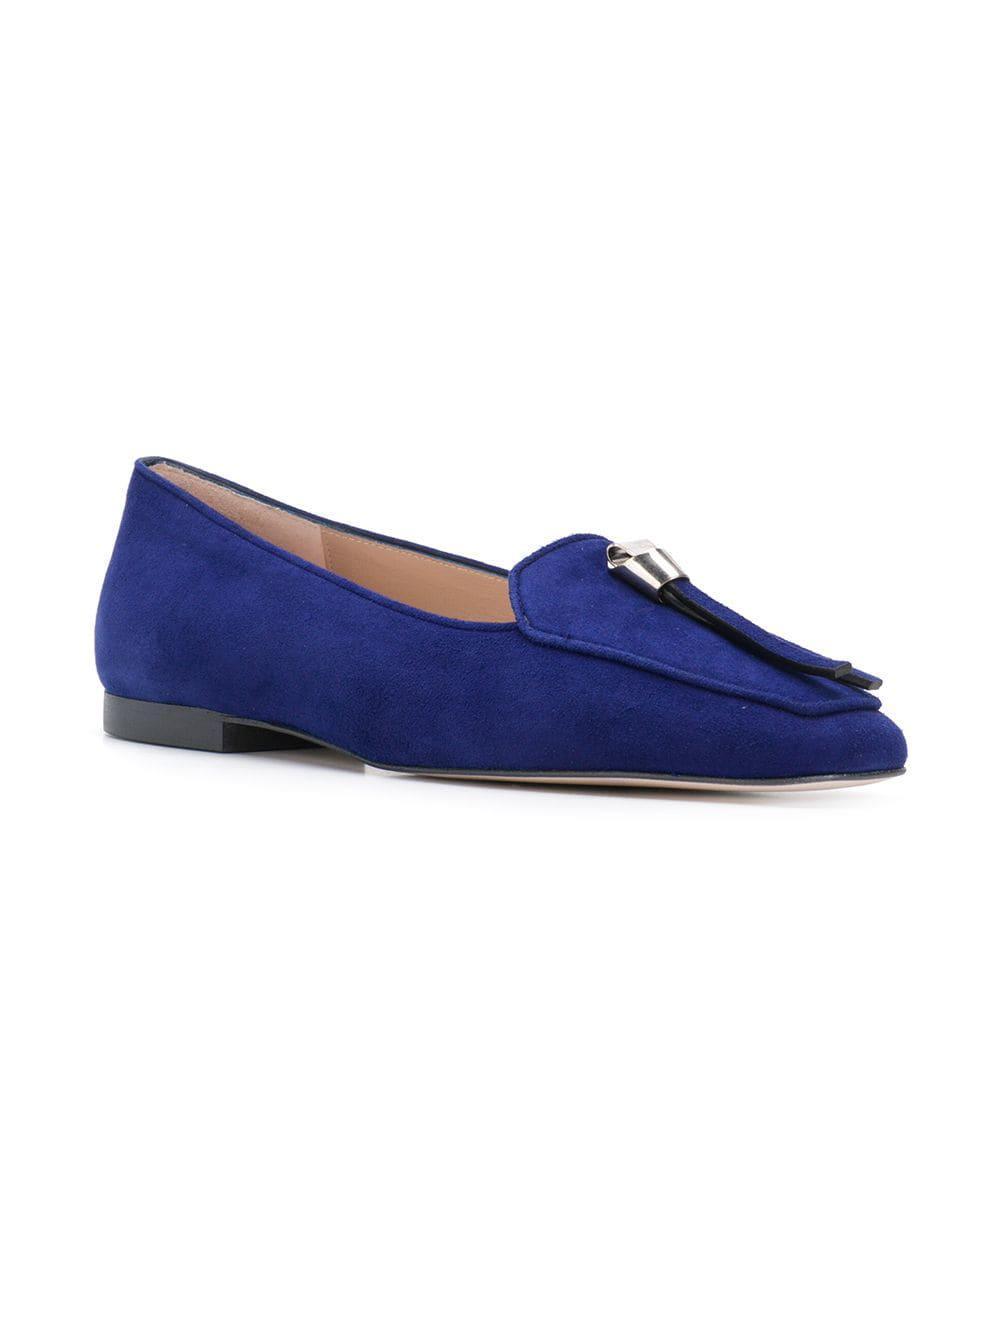 d91951f8261 Stuart Weitzman - Blue Low Heel Loafers - Lyst. View fullscreen